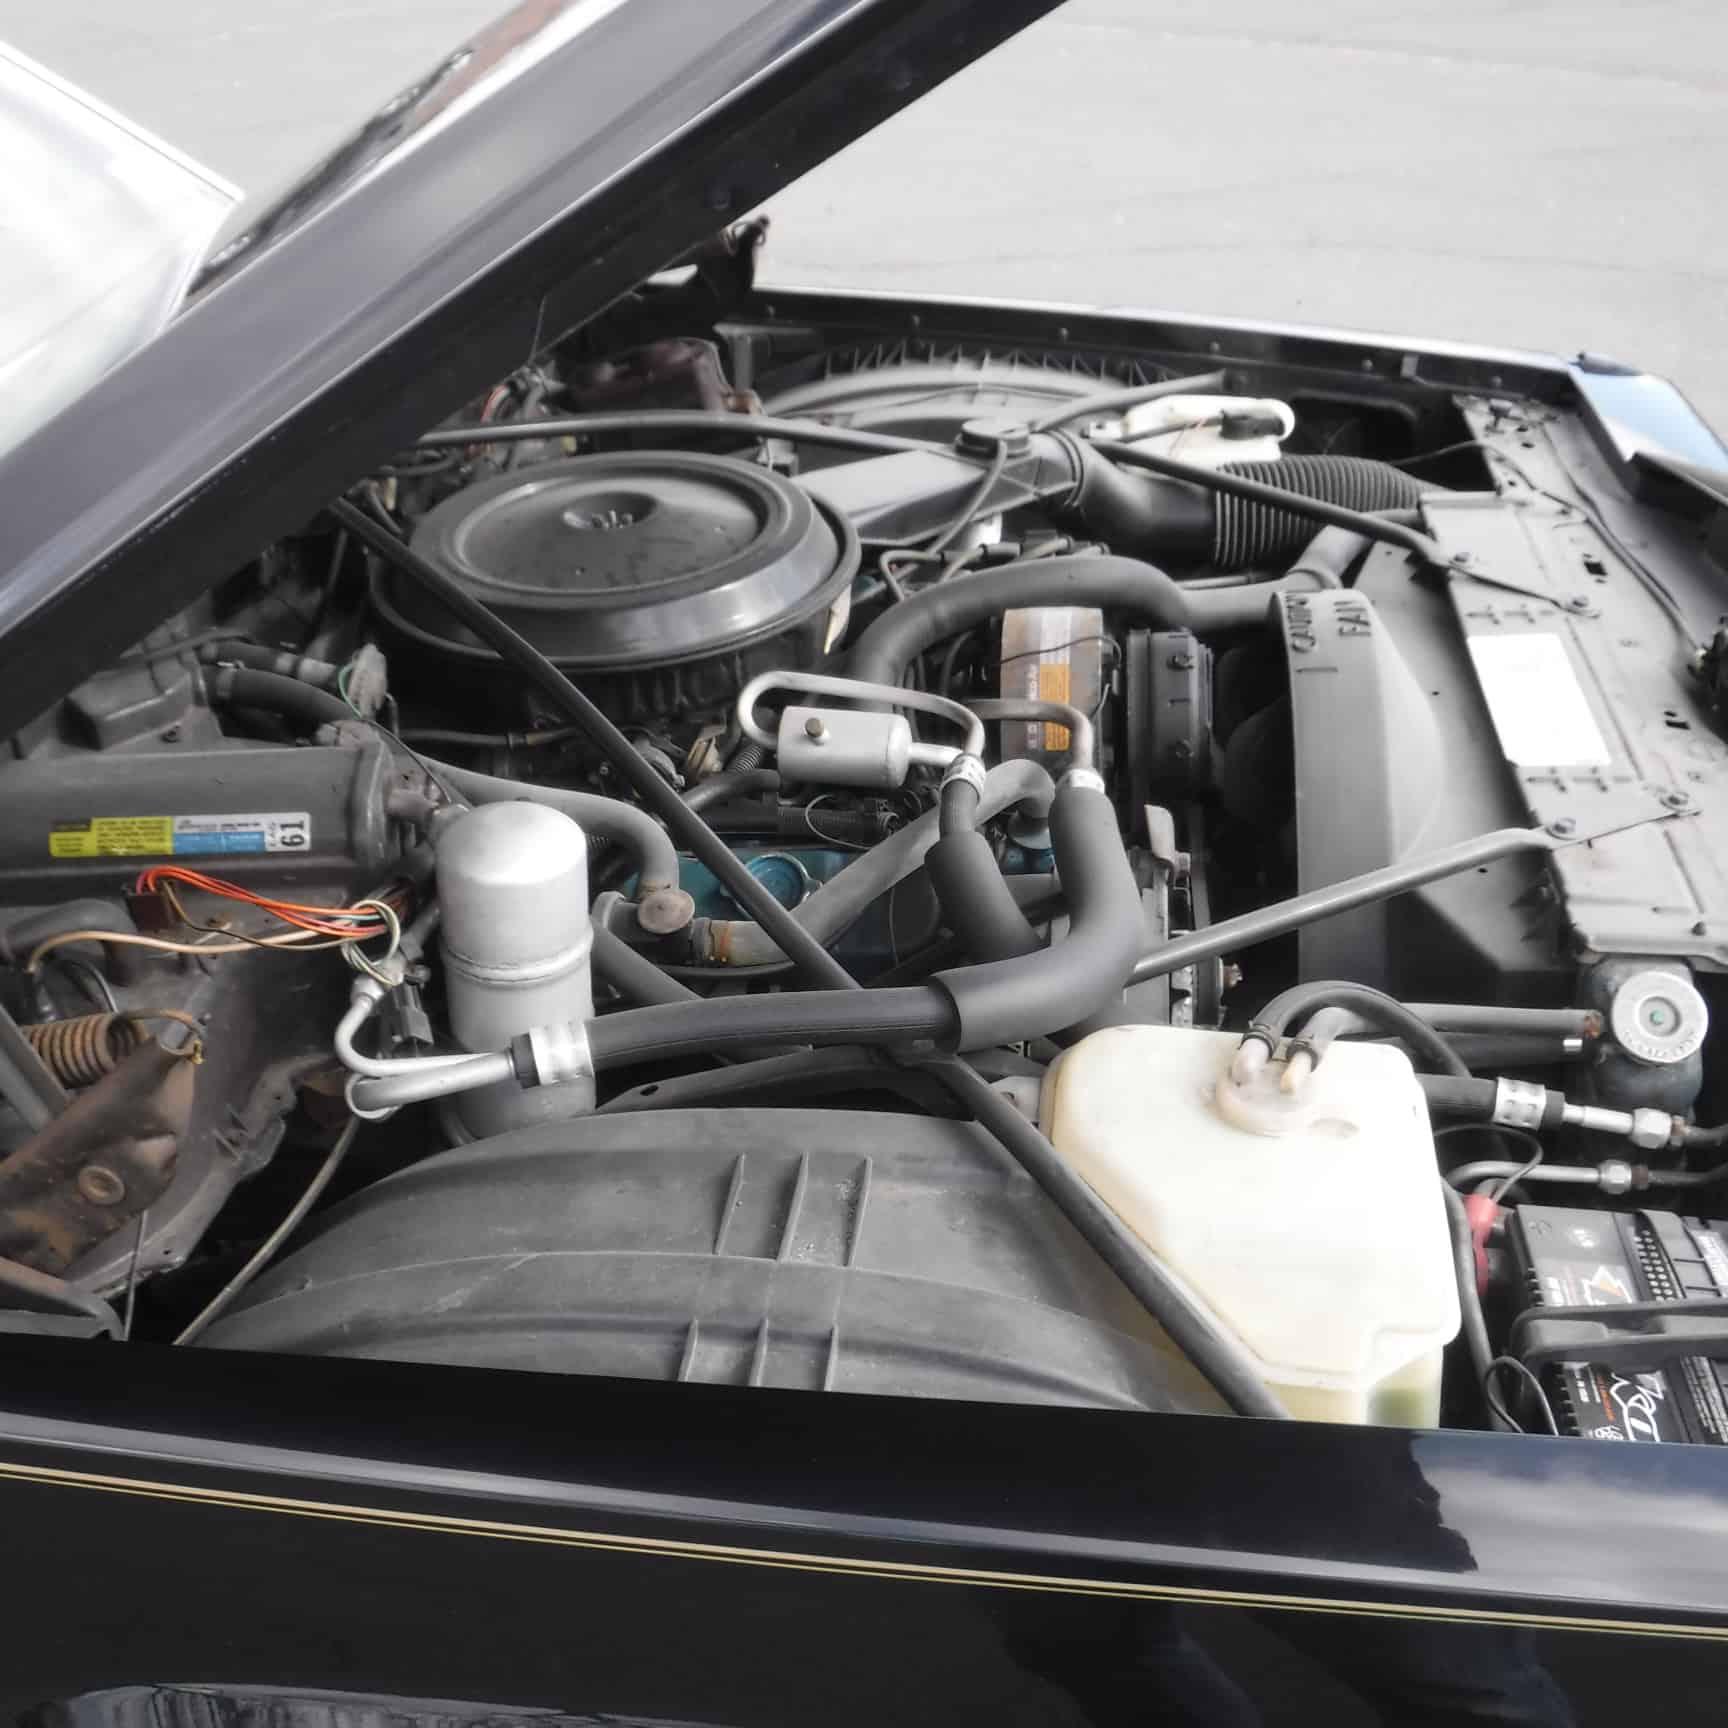 1980 Cadillac 108